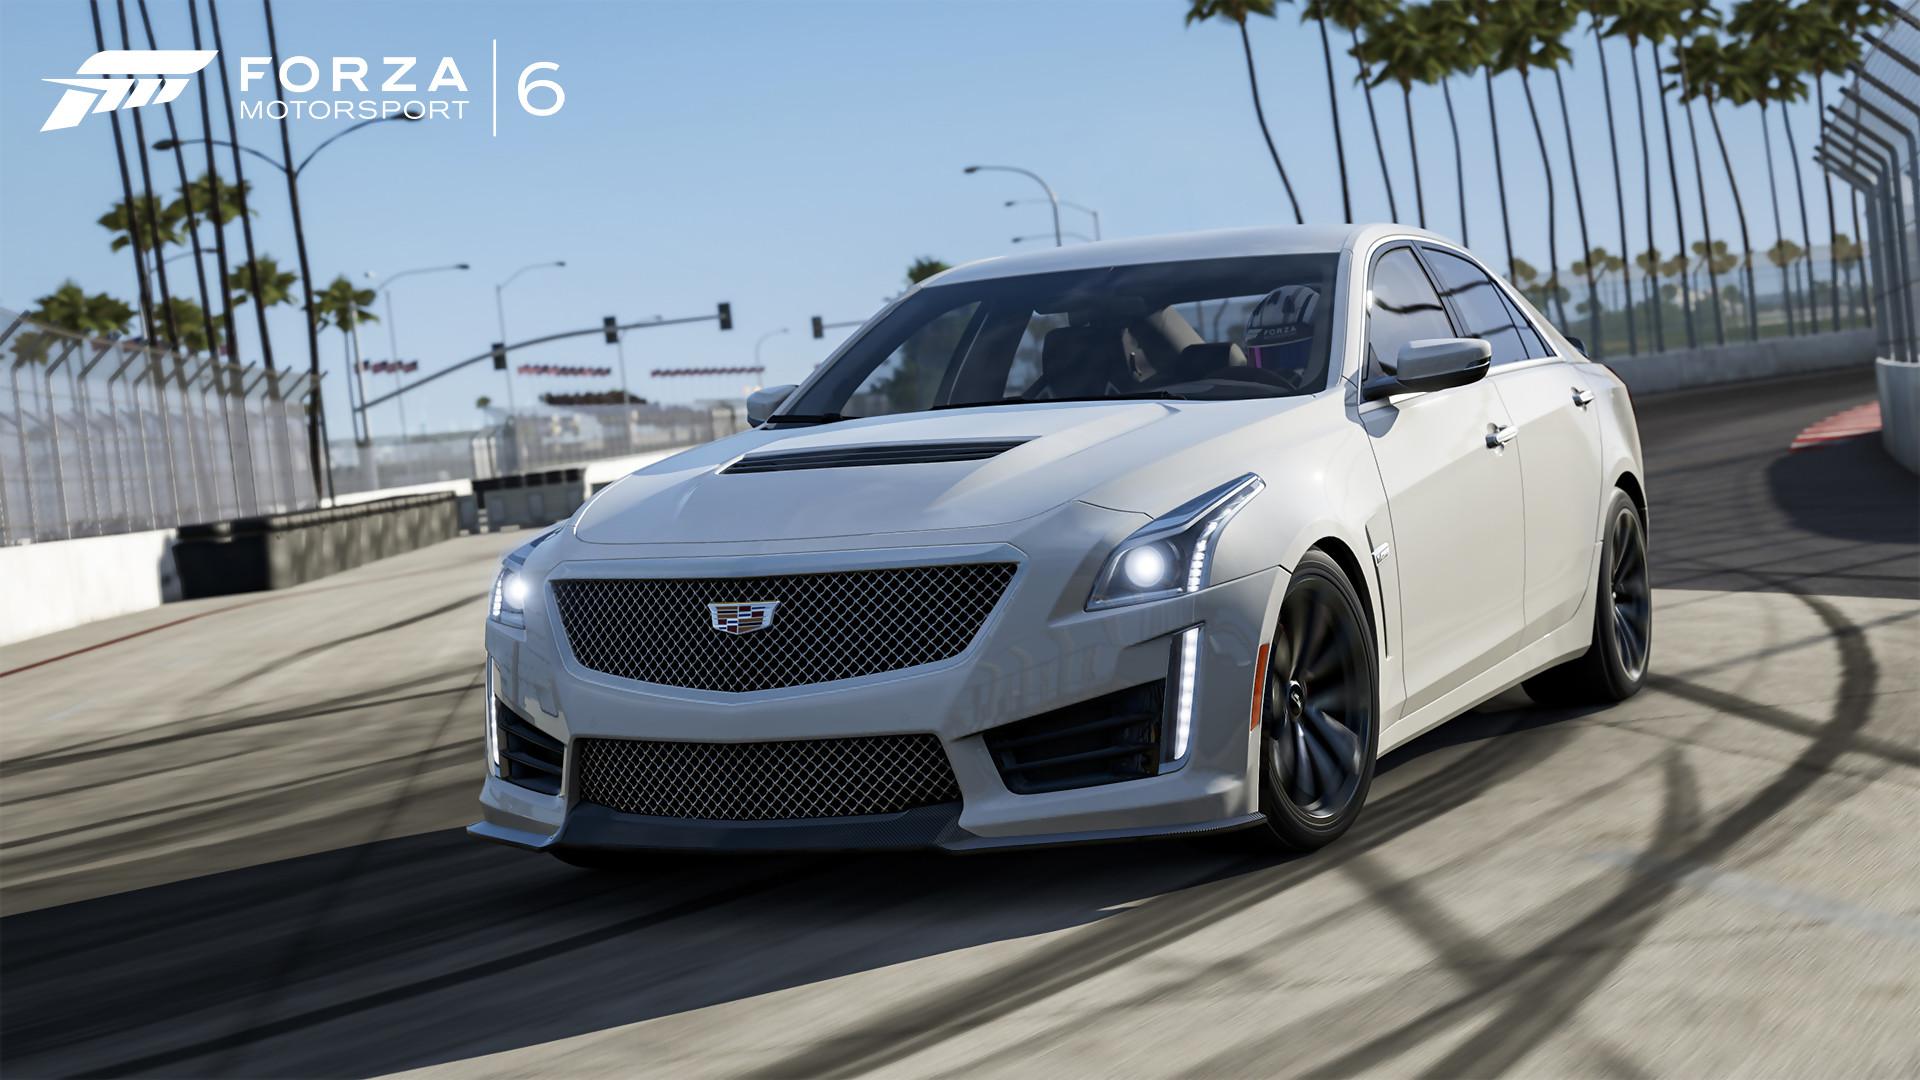 Images Forza Motorsport 6